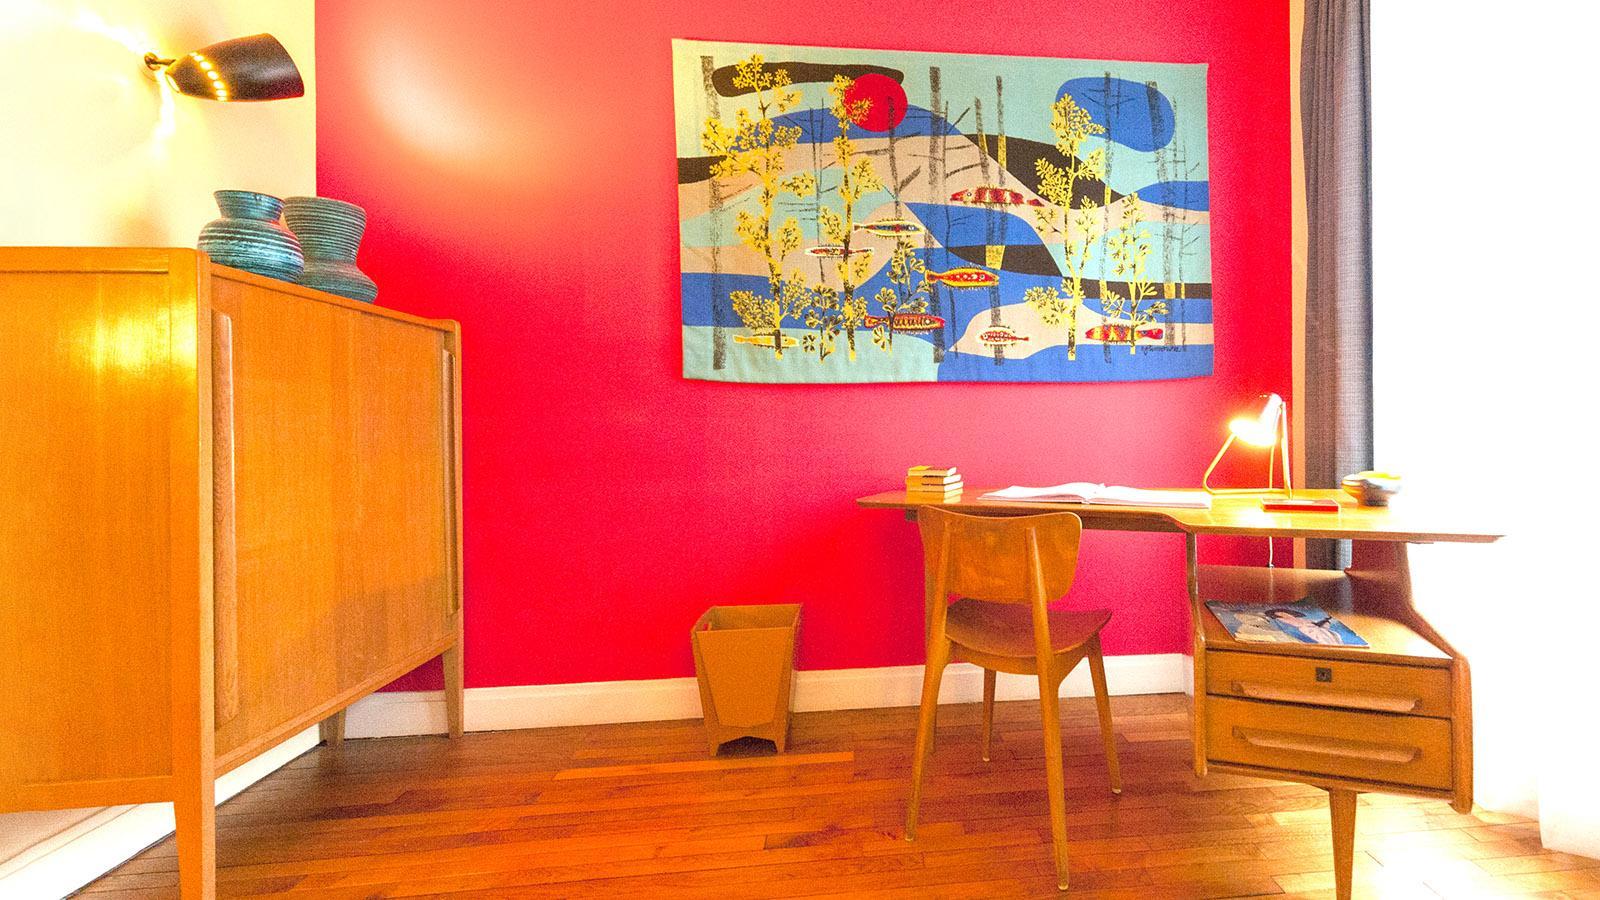 Appartement Témoin: Das Arbeitszimmer. Foto: Hilke Maunder